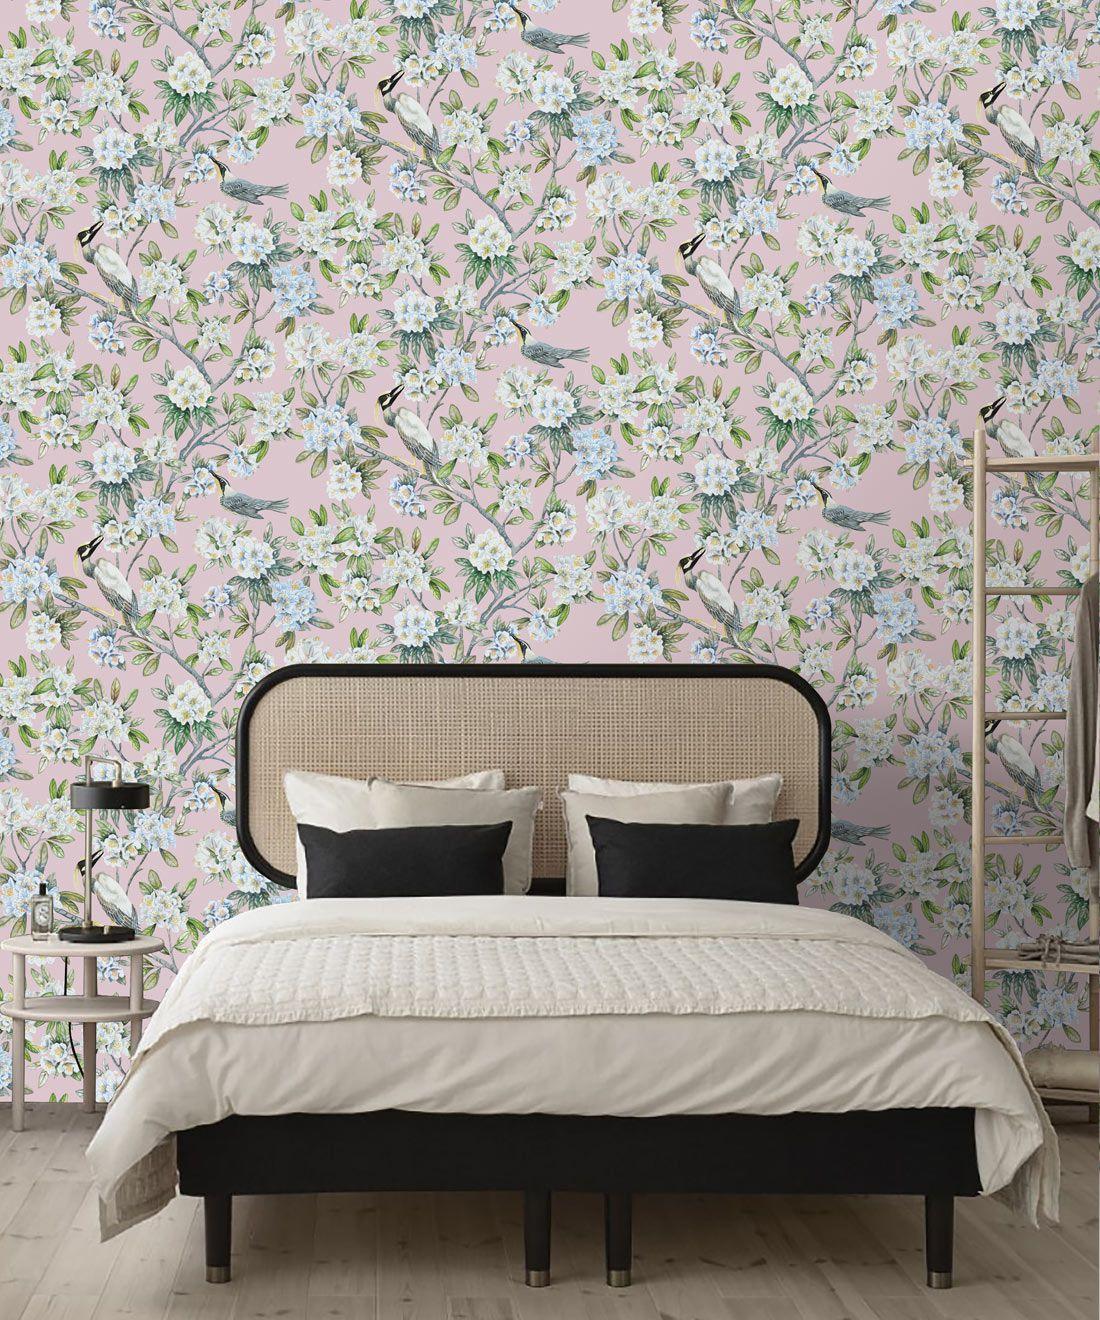 Victoria Wallpaper • Floral Wallpaper • Pink Wallpaper • Insitu